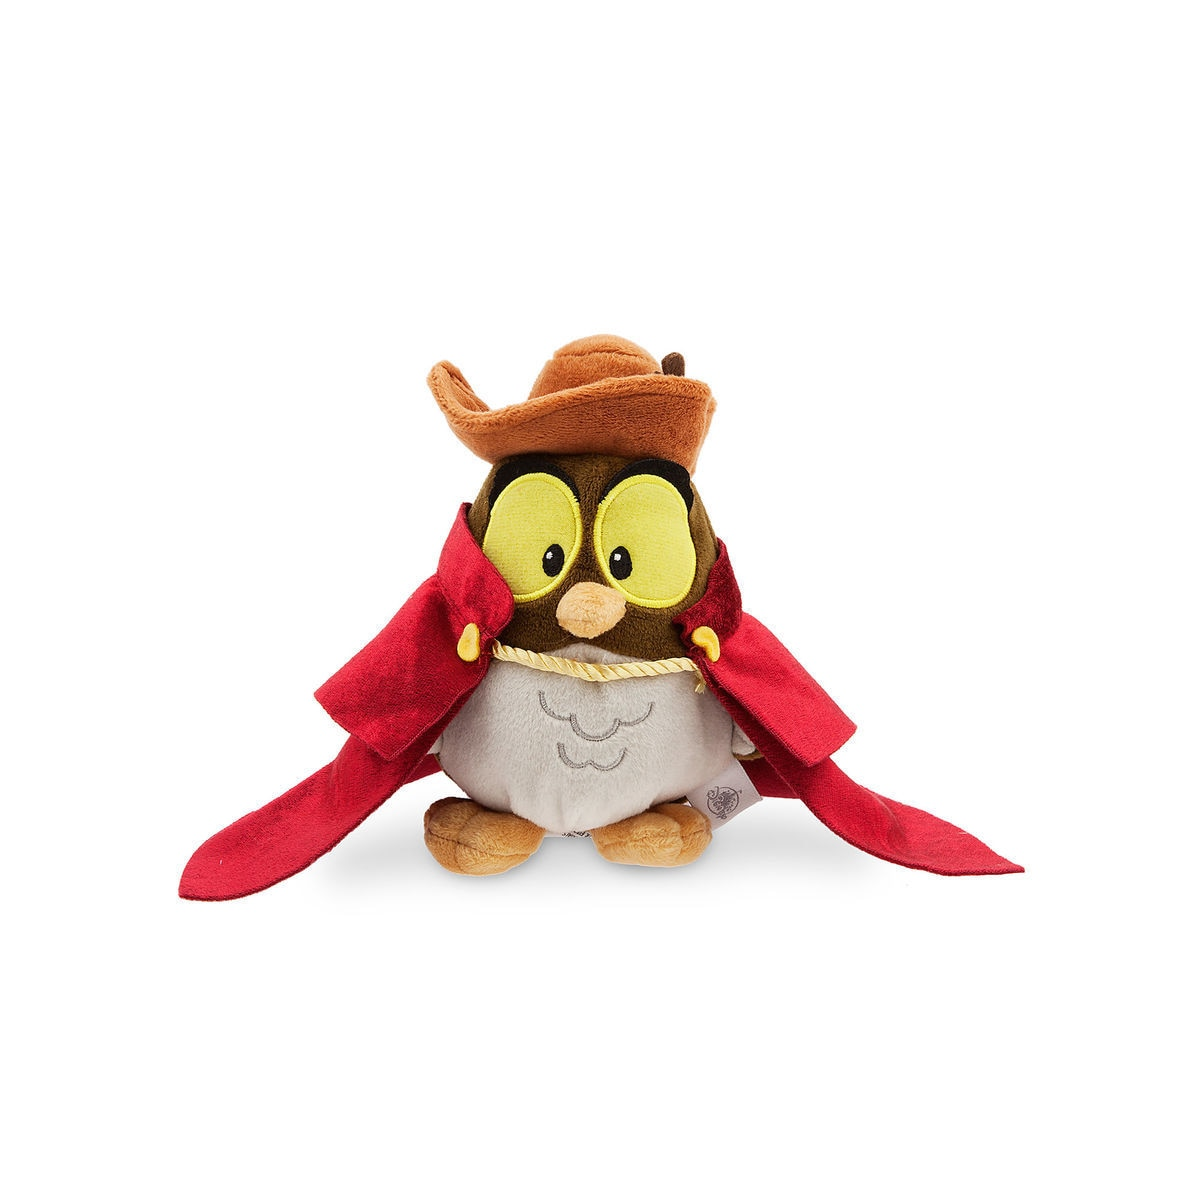 Owl Plush Sleeping Beauty Small 6 Shopdisney